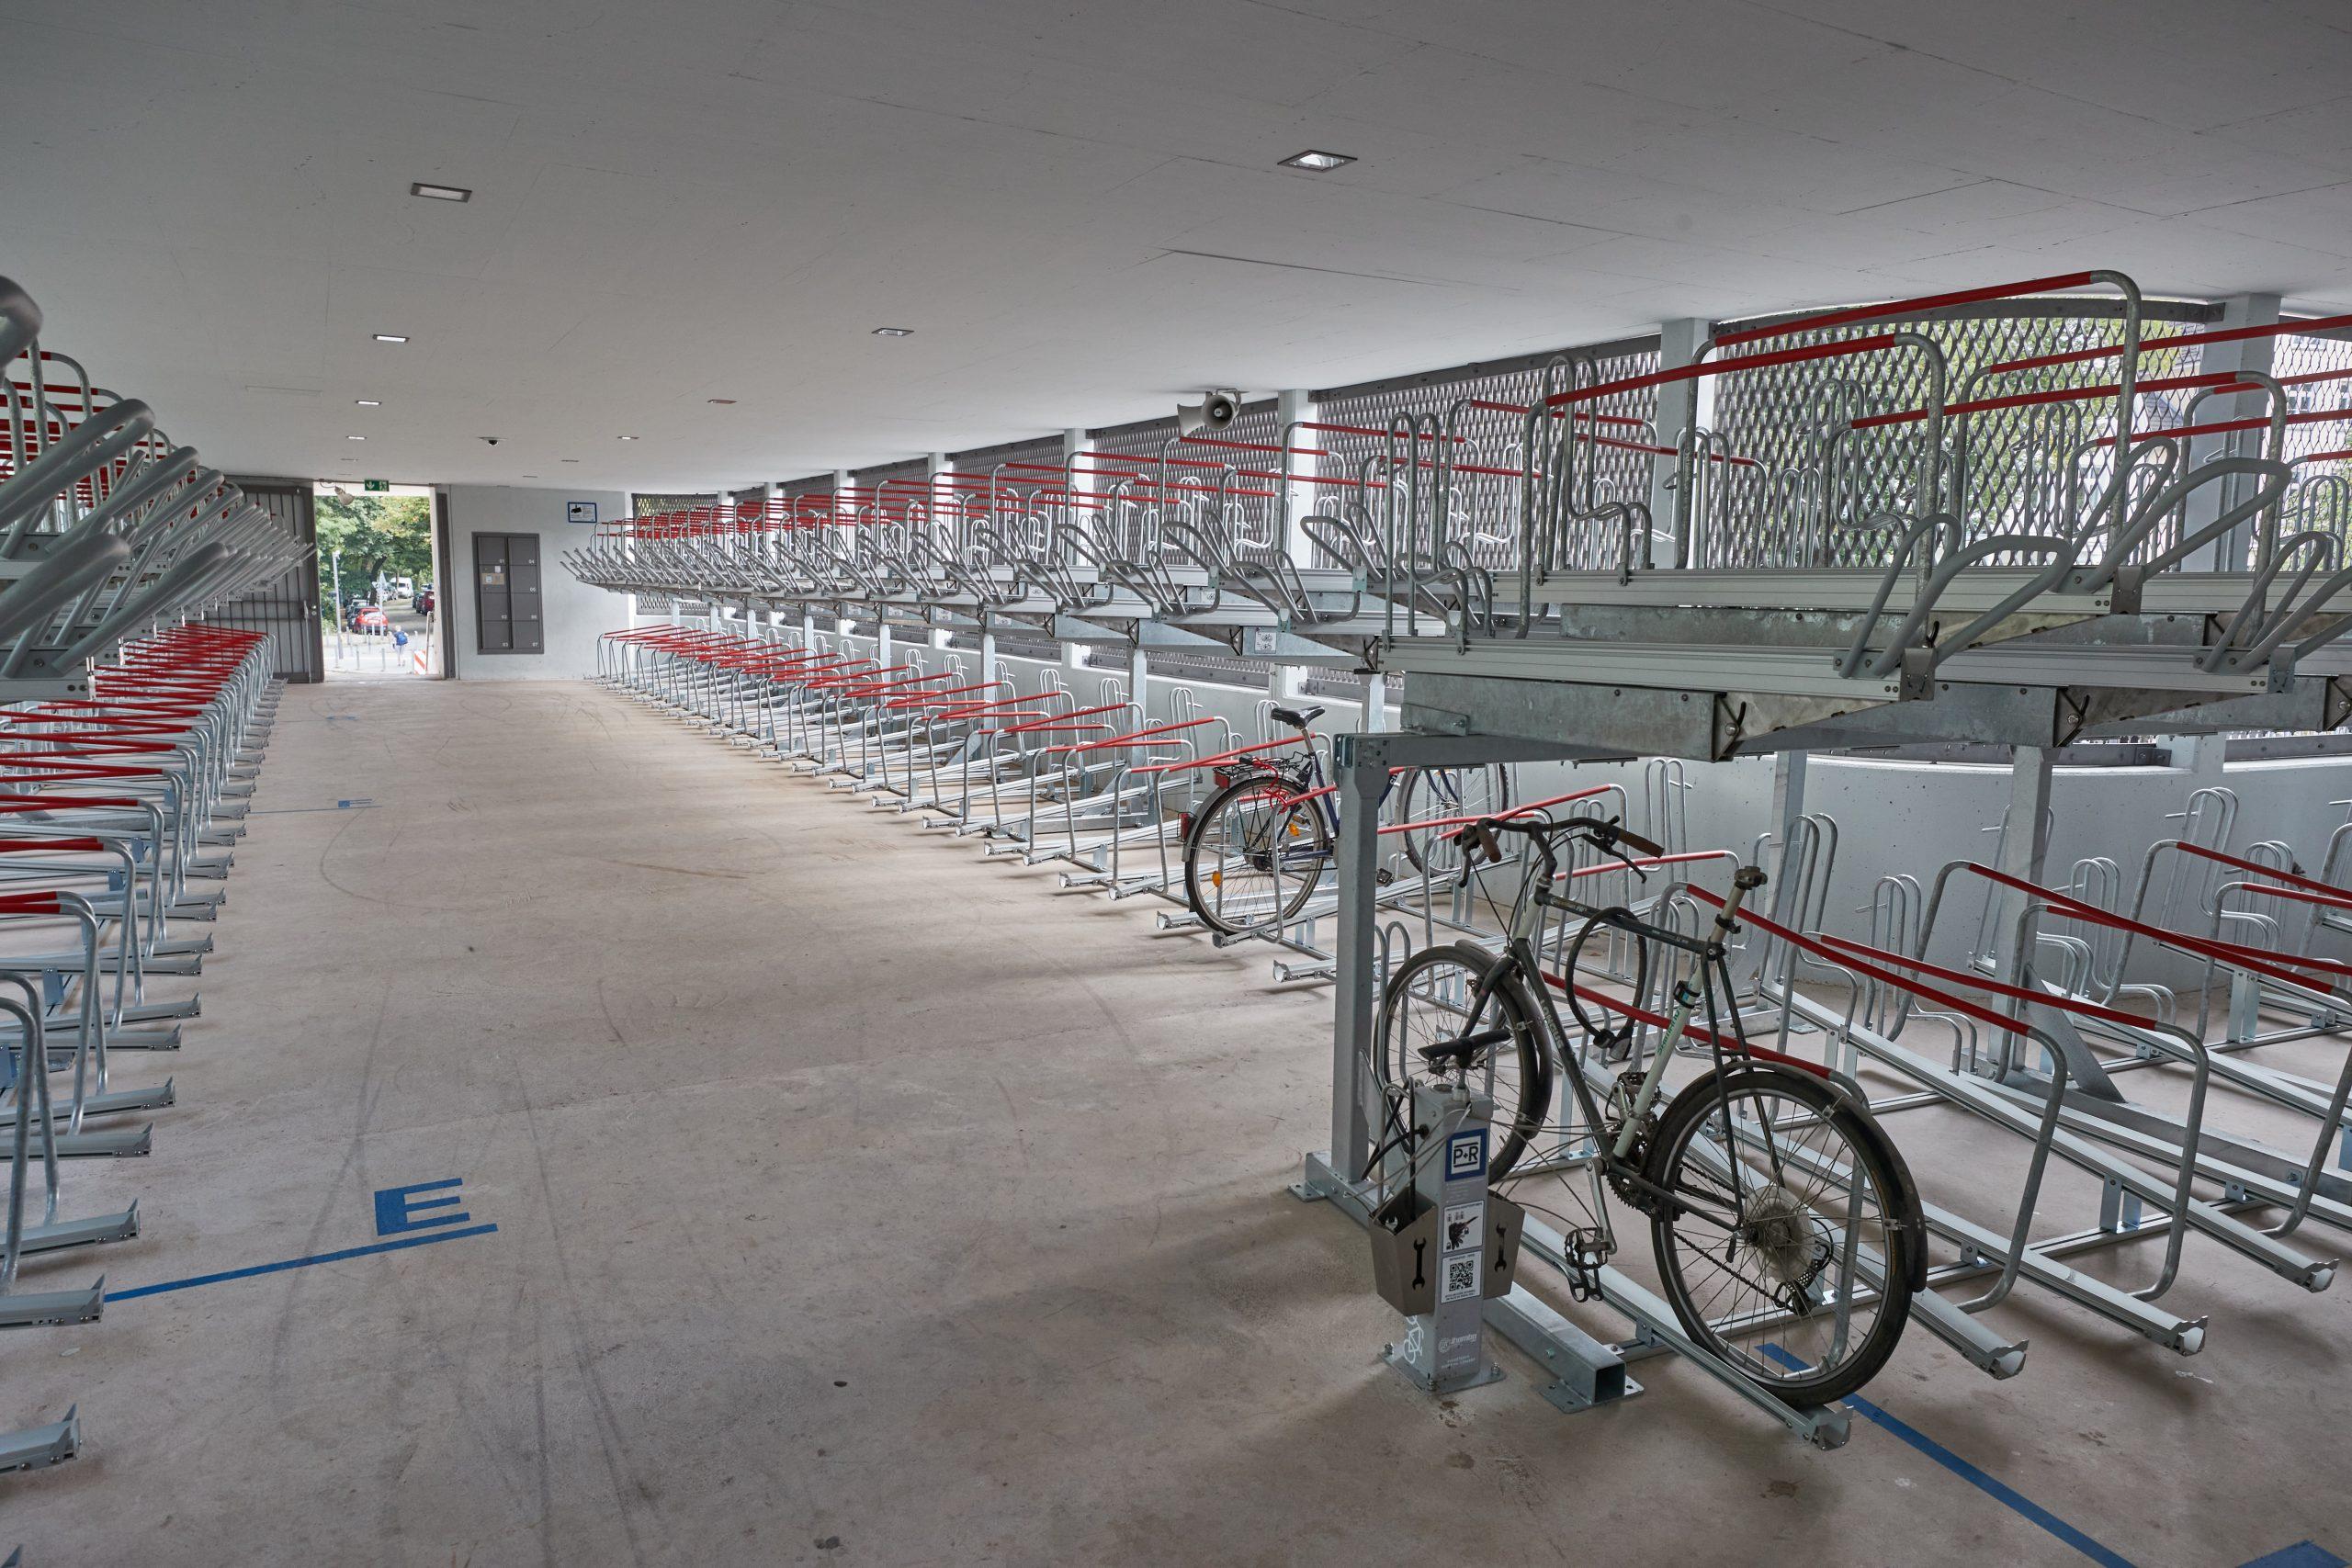 Blick in die obere Etage mit Fahrradständern des Fahrradparkhauses an der Haltestelles Kellinghusenstraße.